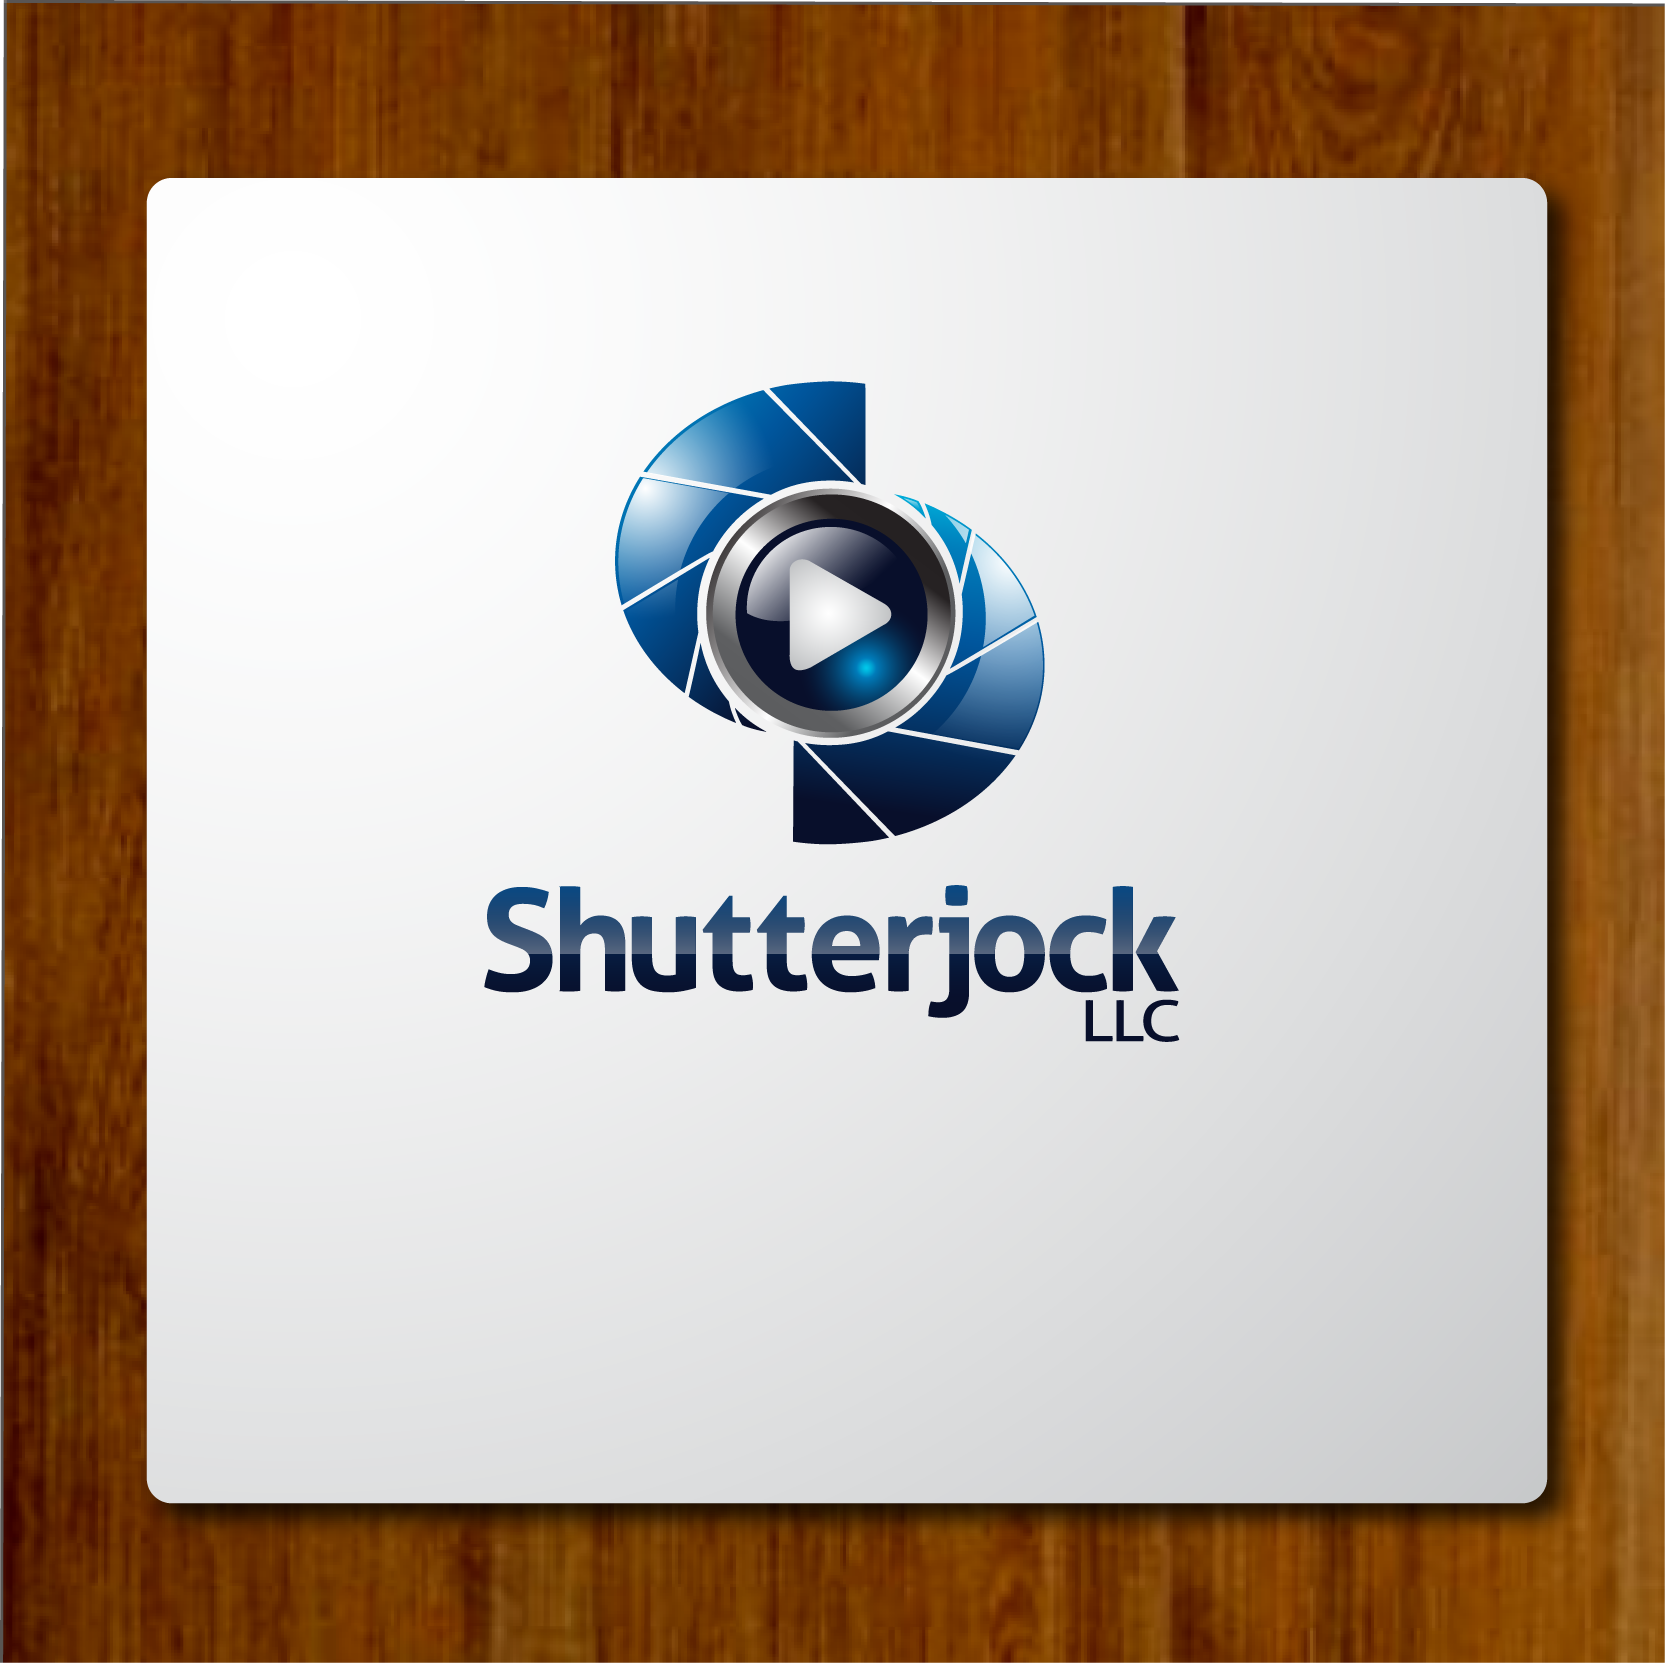 Logo Design by DENOK - Entry No. 117 in the Logo Design Contest Unique Logo Design Wanted for Shutterjock LLC.